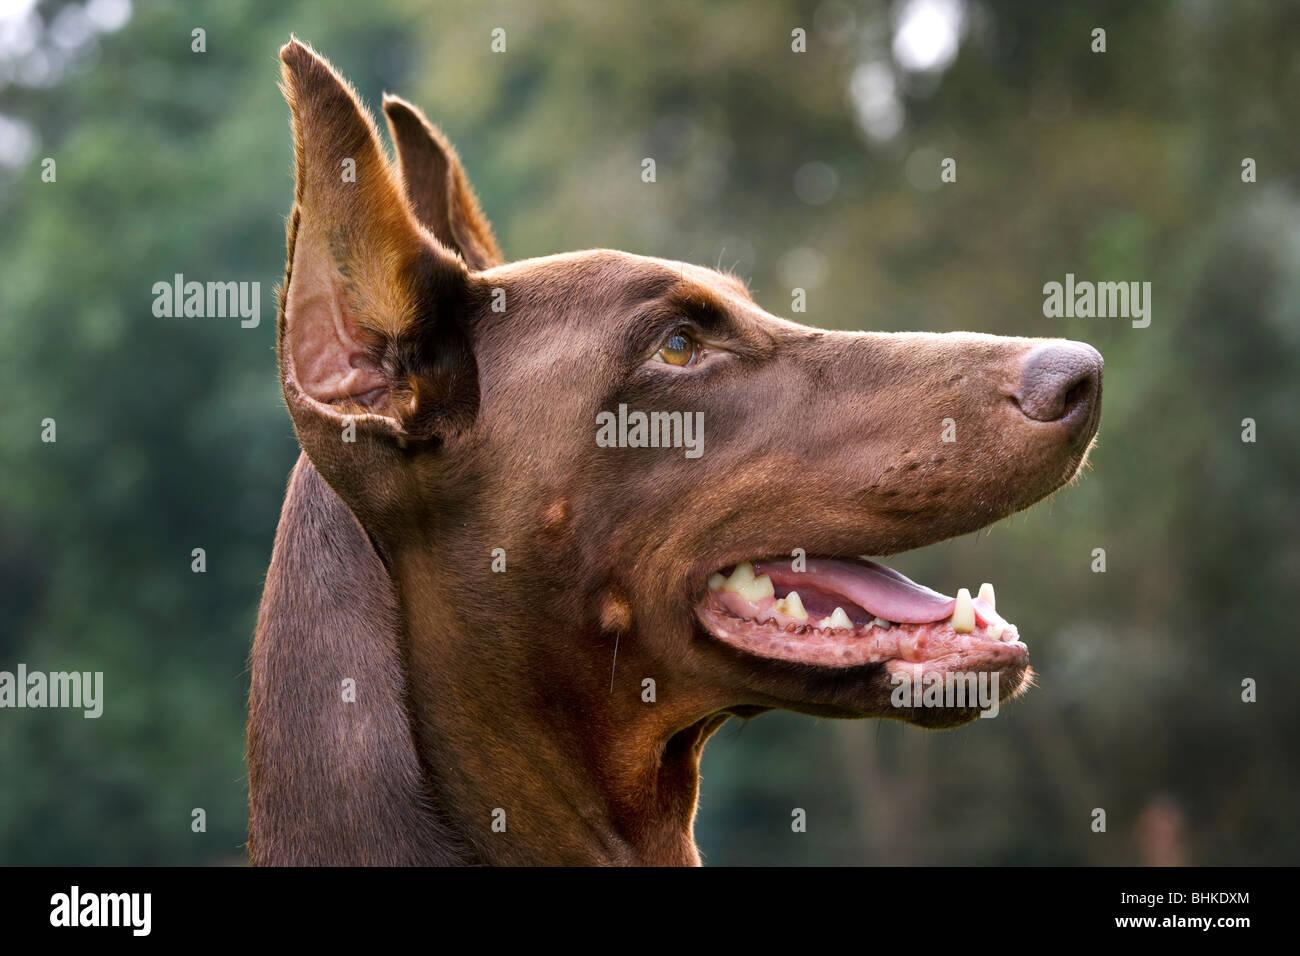 Doberman Pinscher / Pincher / Dobermann (Canis lupus familiaris) in garden - Stock Image